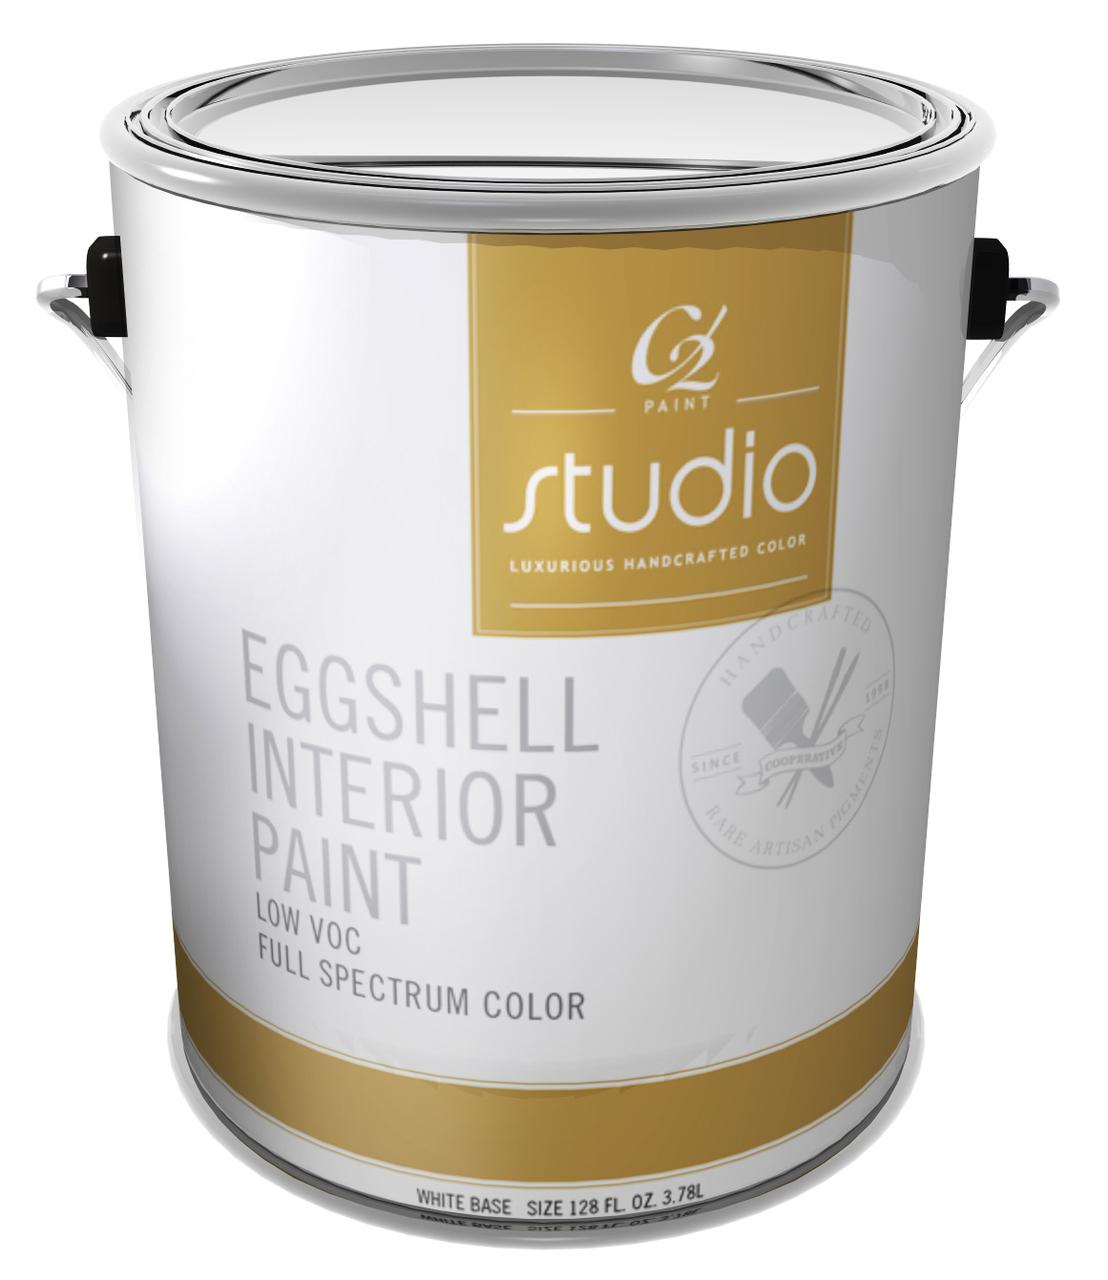 c2-studio-eggshell